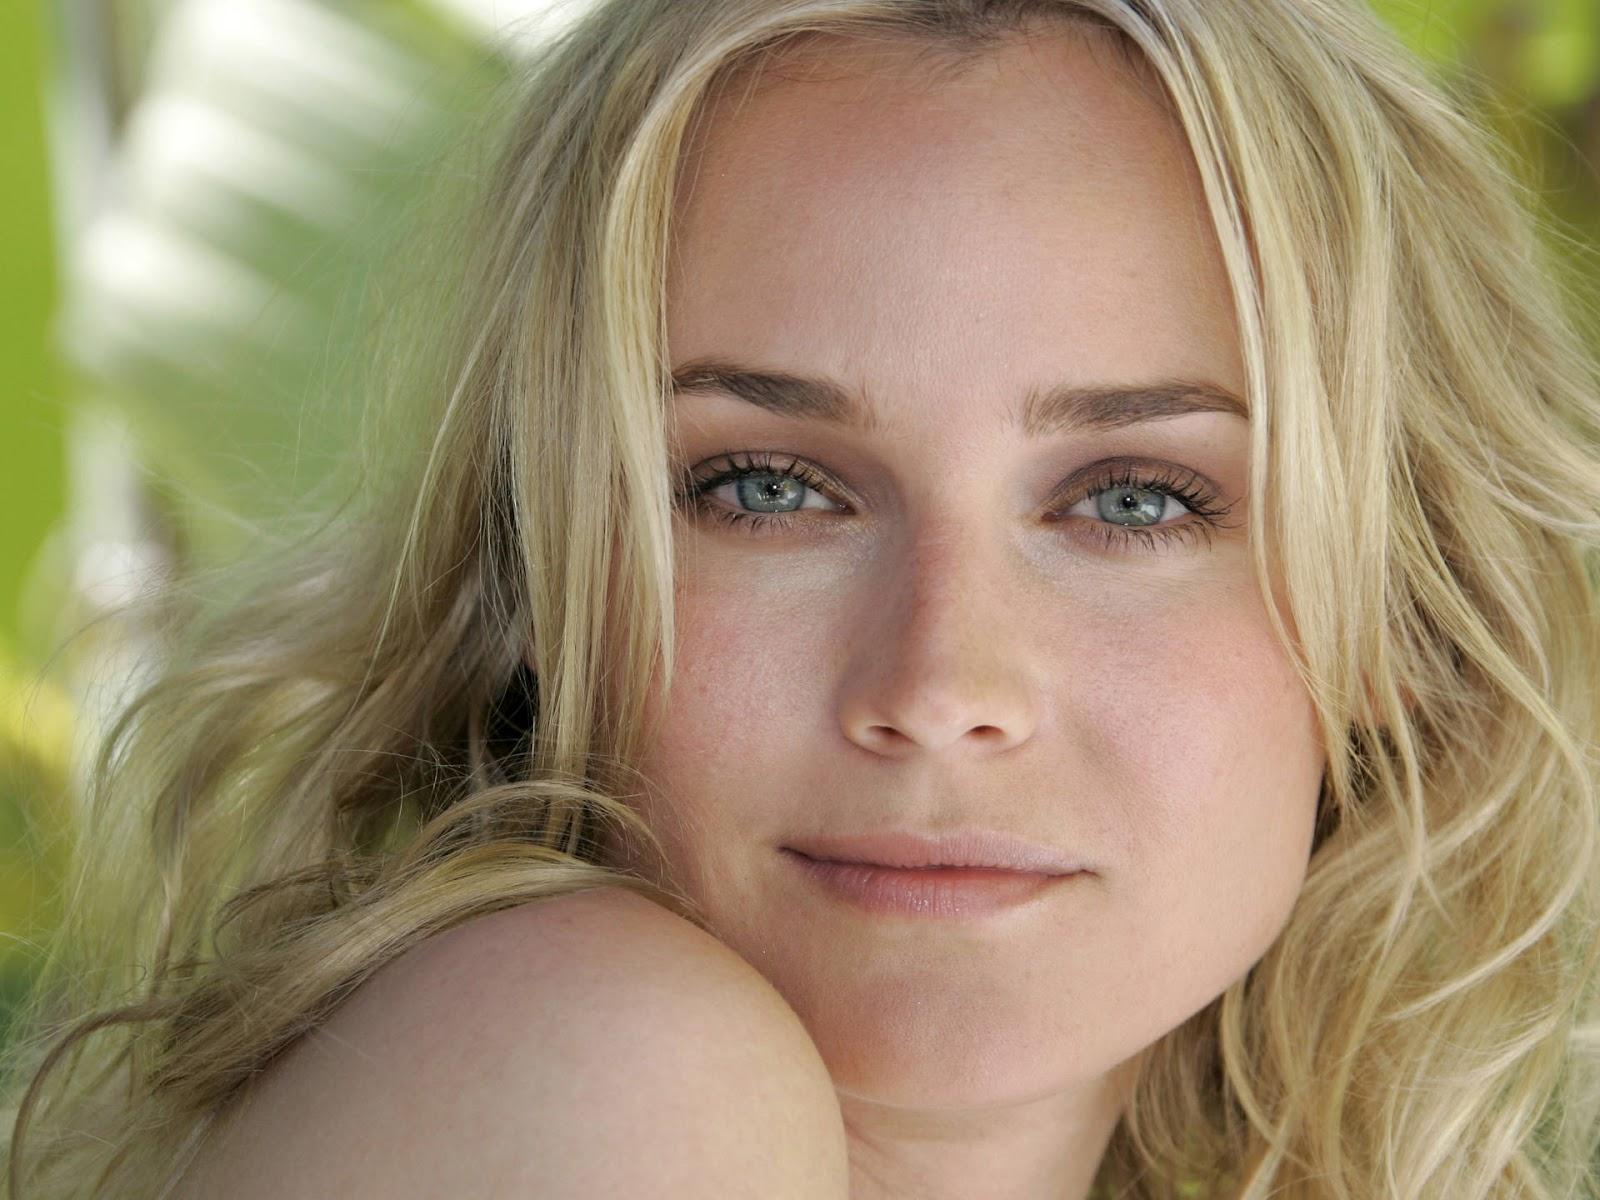 actress model beautiful - photo #29